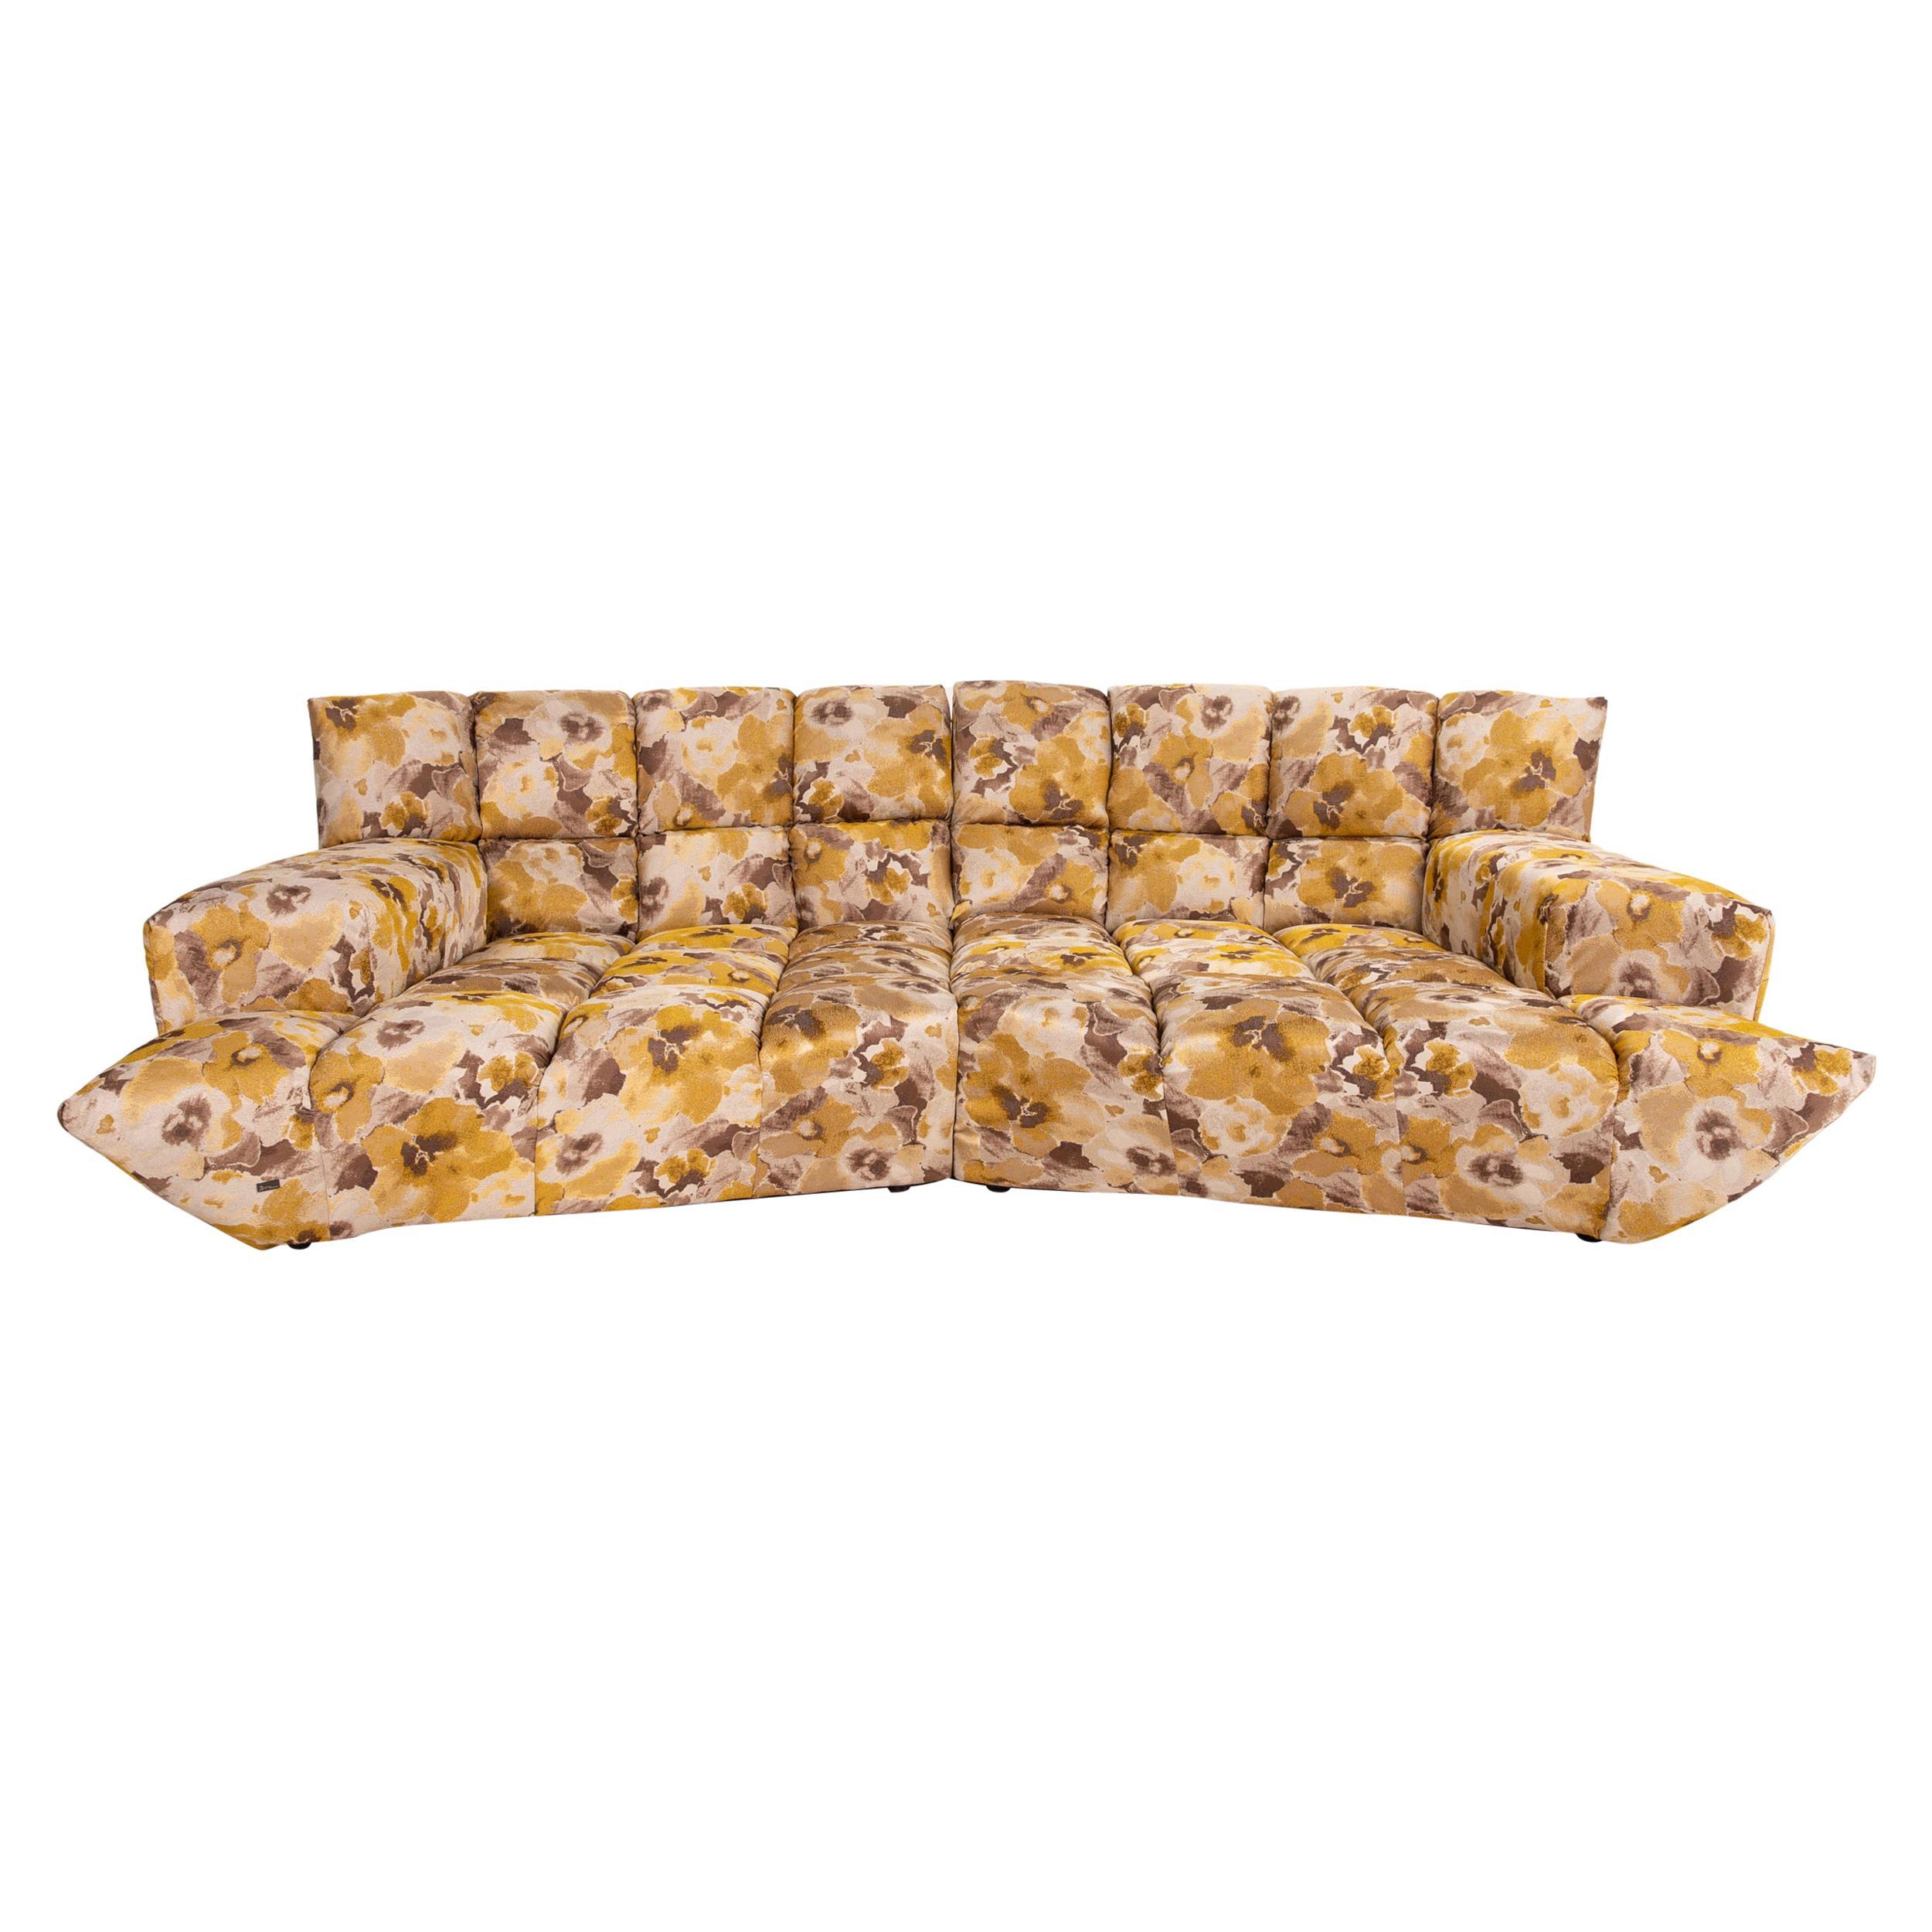 Bretz Cloud 7 Velvet Fabric Corner Sofa Yellow Gold Brown Sofa Couch Modular